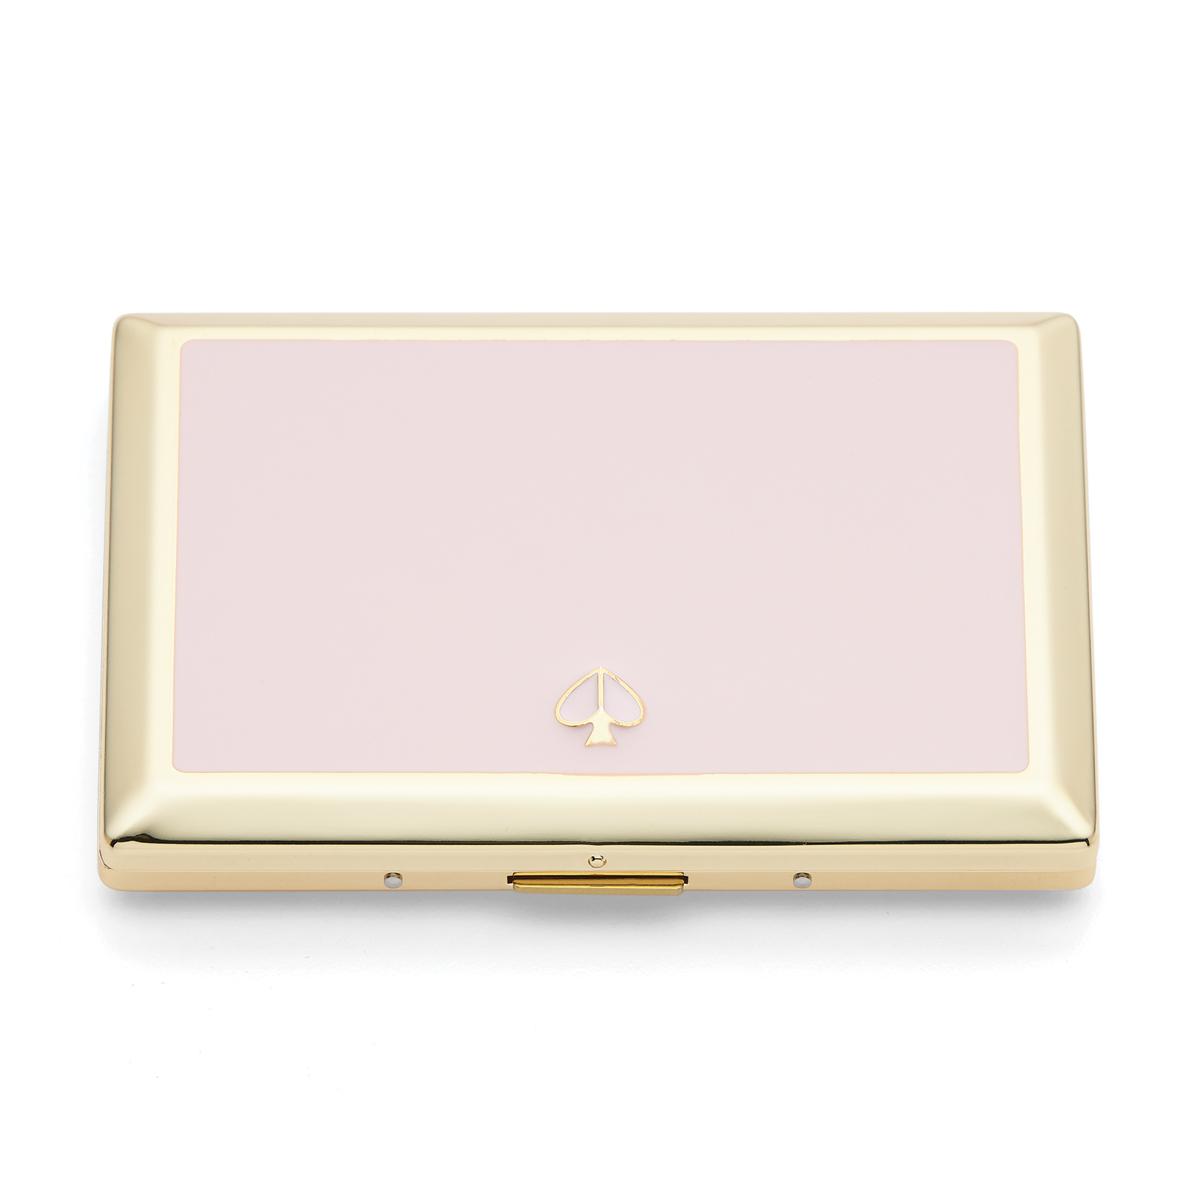 Kate Spade New York, Lenox Spade Street Gold Business Card Holder, Blush